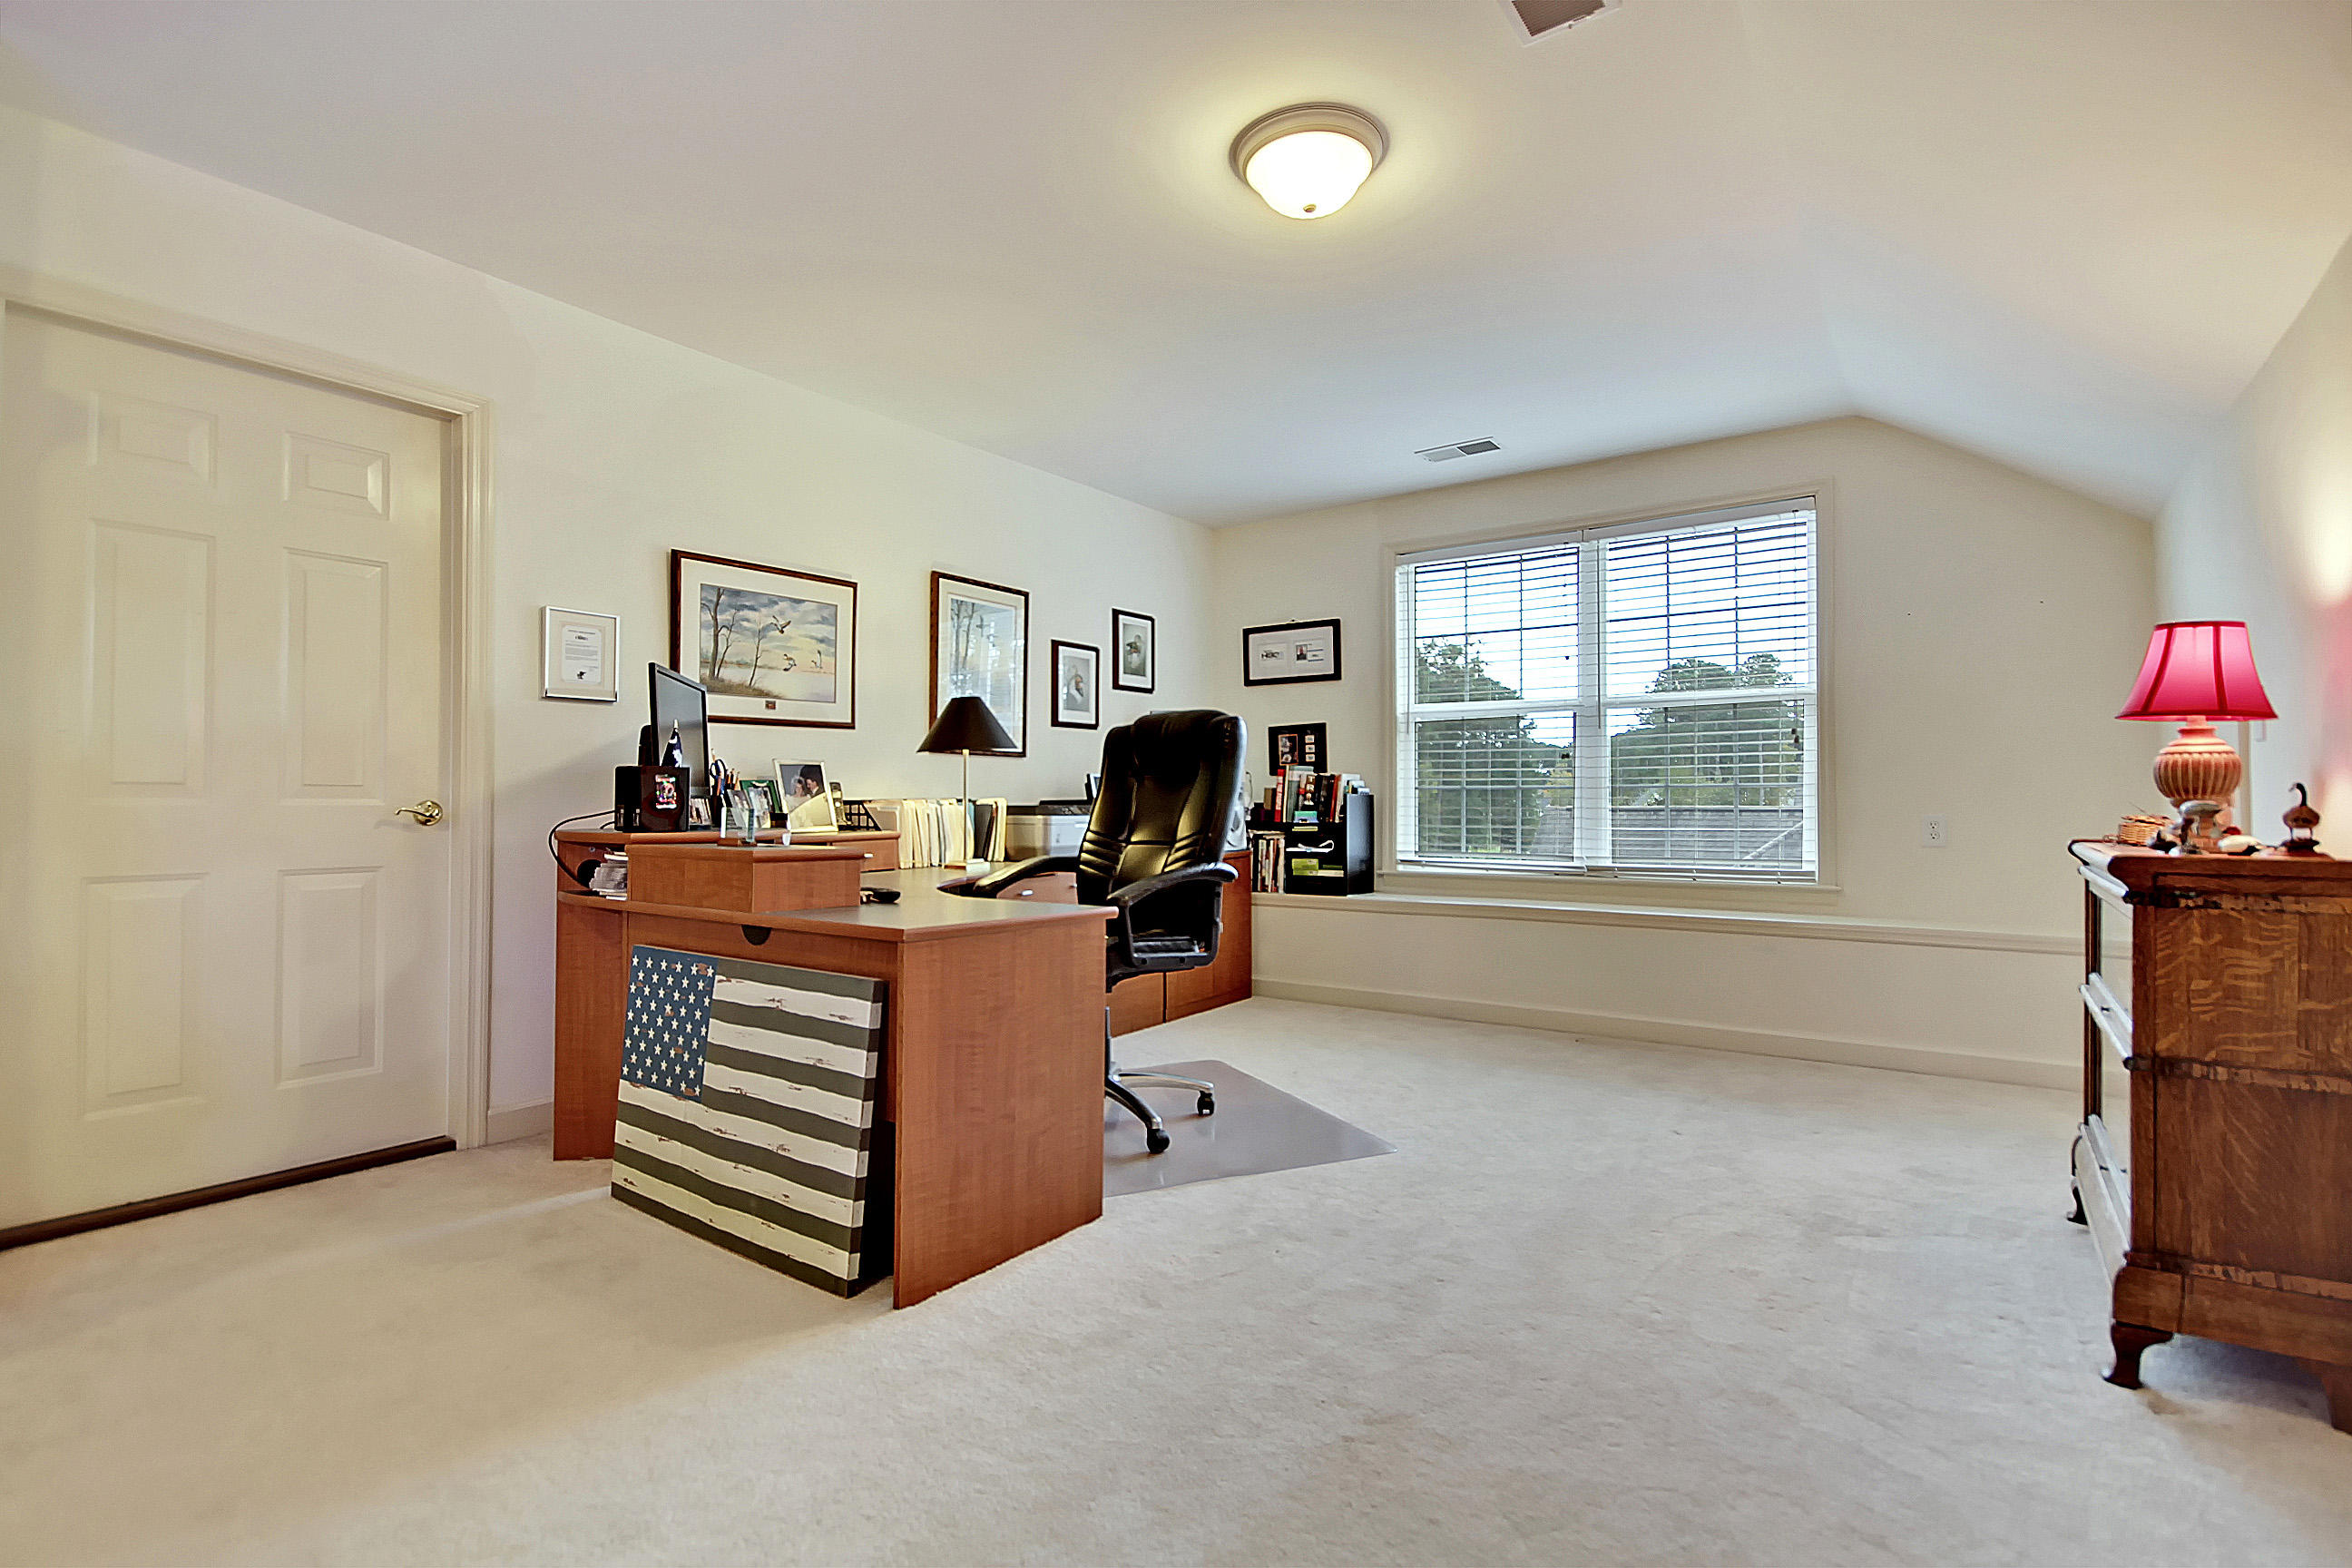 Dunes West Homes For Sale - 2449 Darts Cove, Mount Pleasant, SC - 42